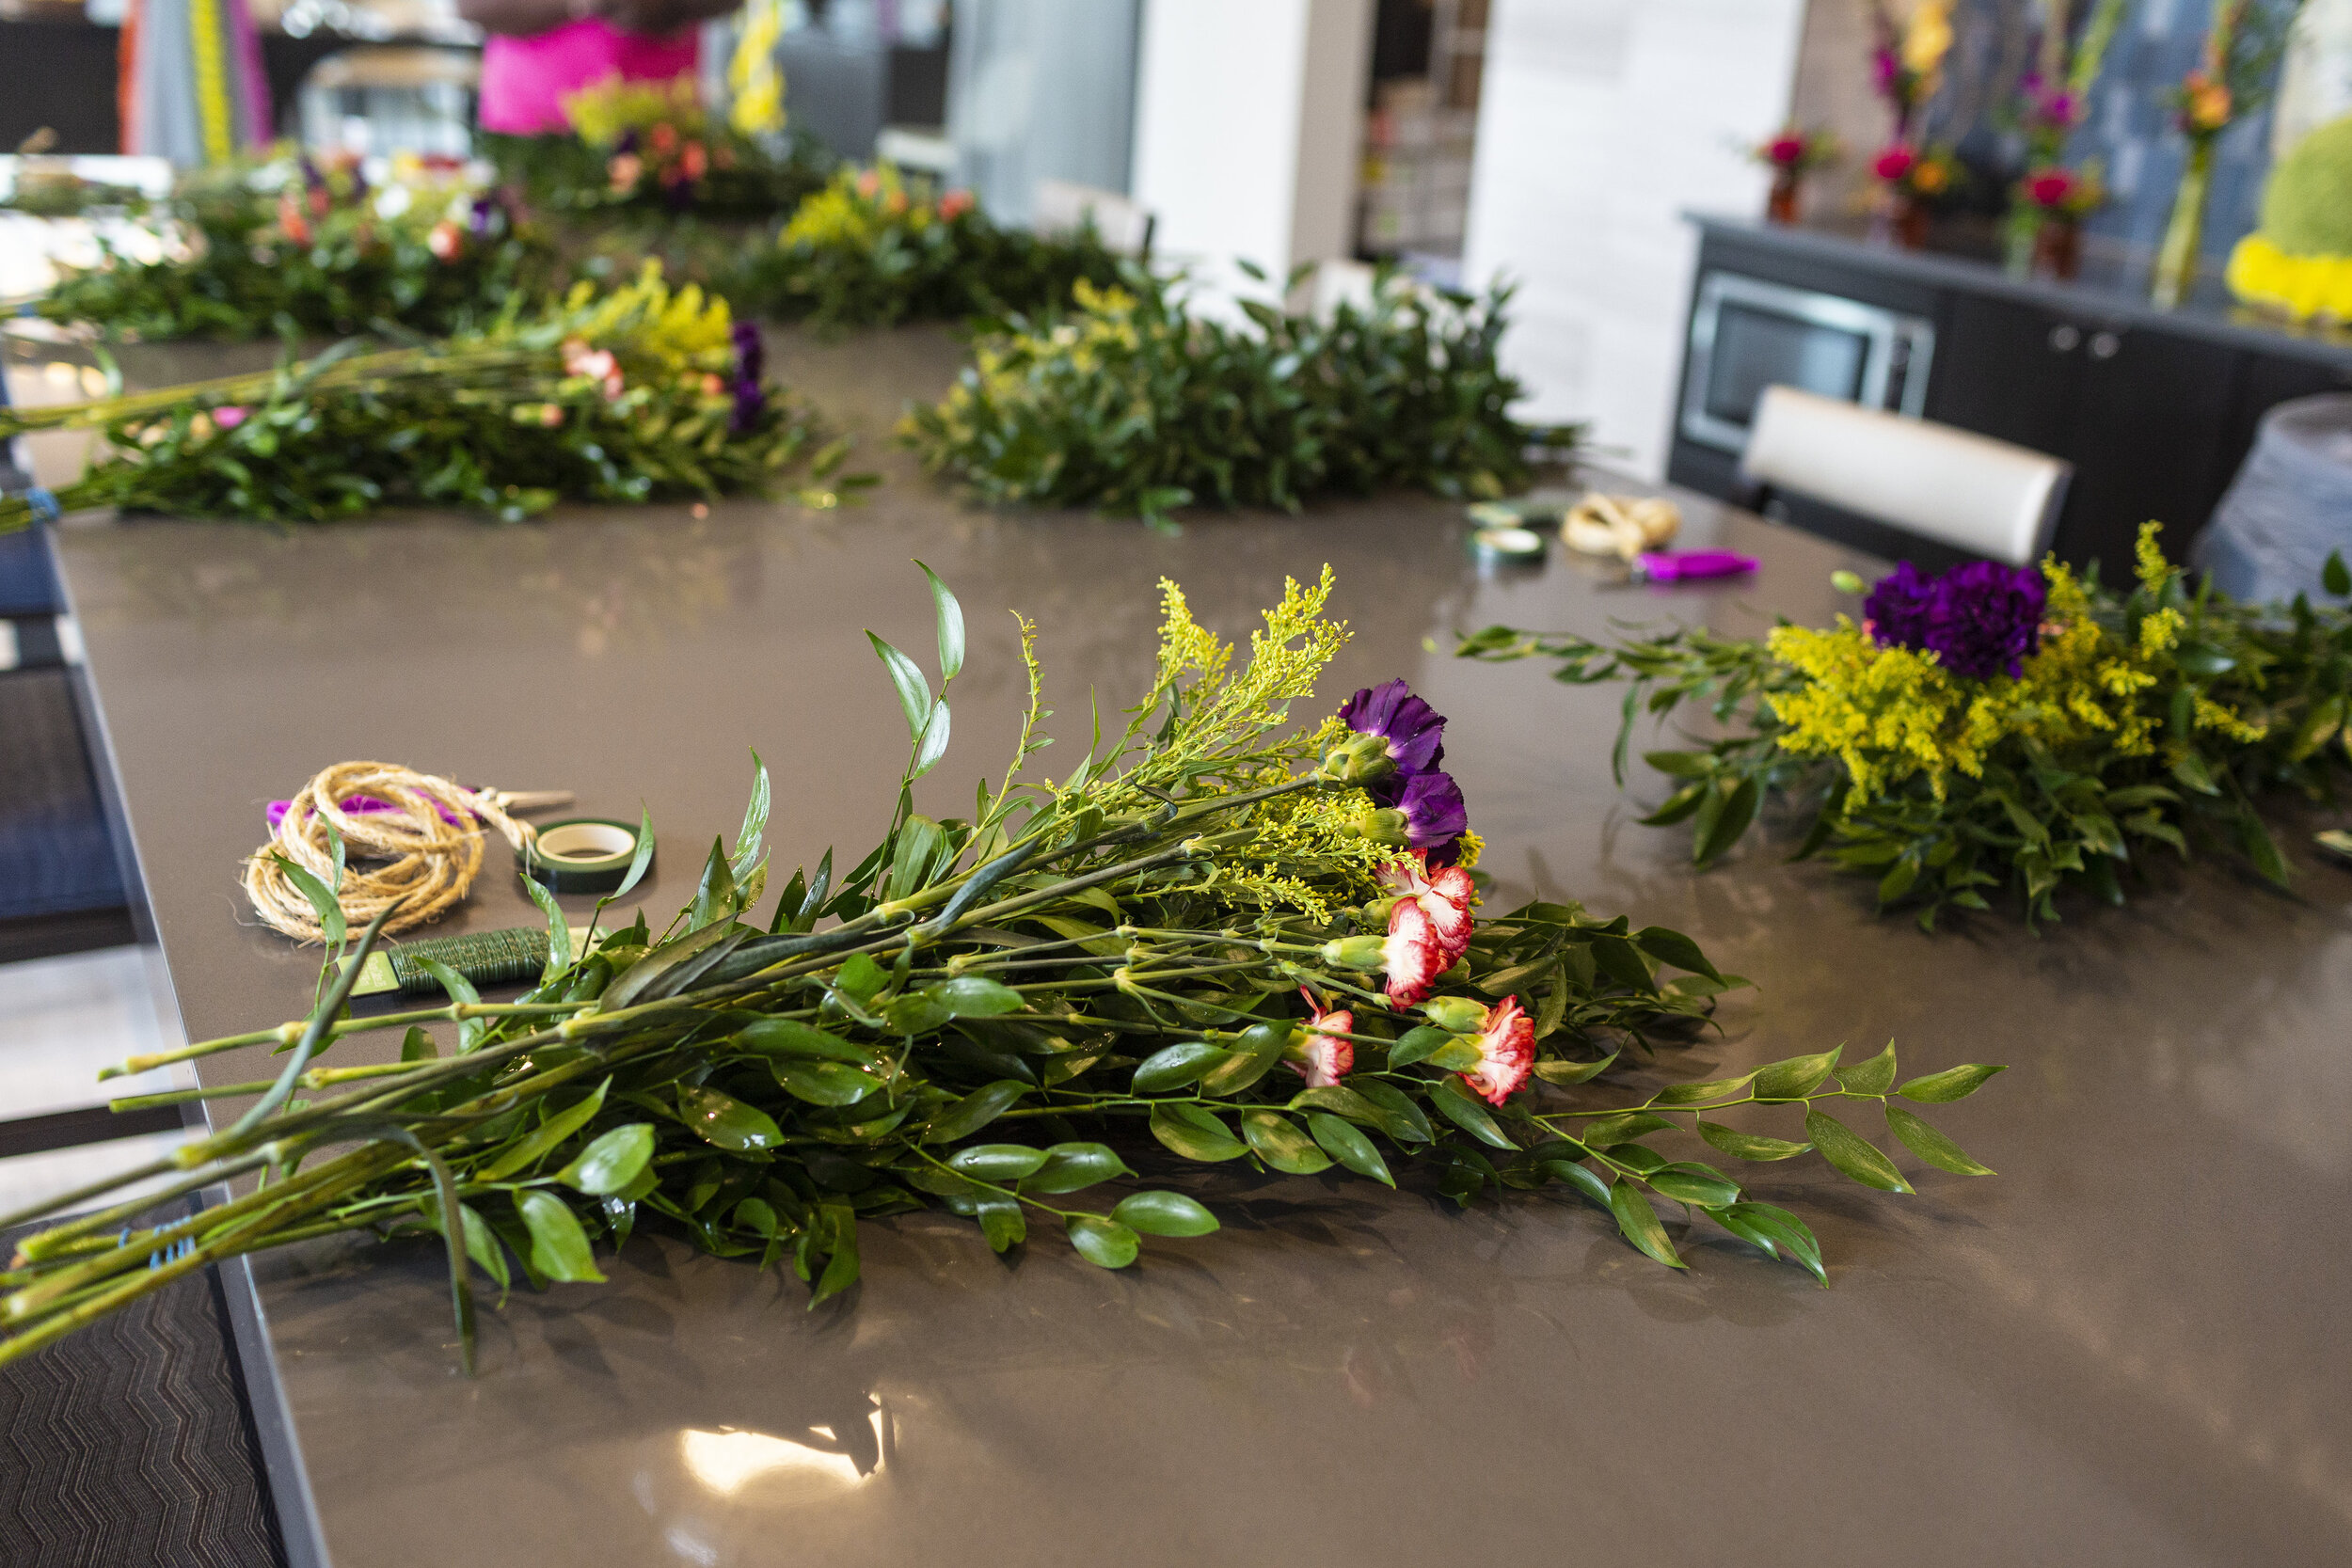 How To Have An Great Floral Design Session - Casa De Flores Designer's Club Tips